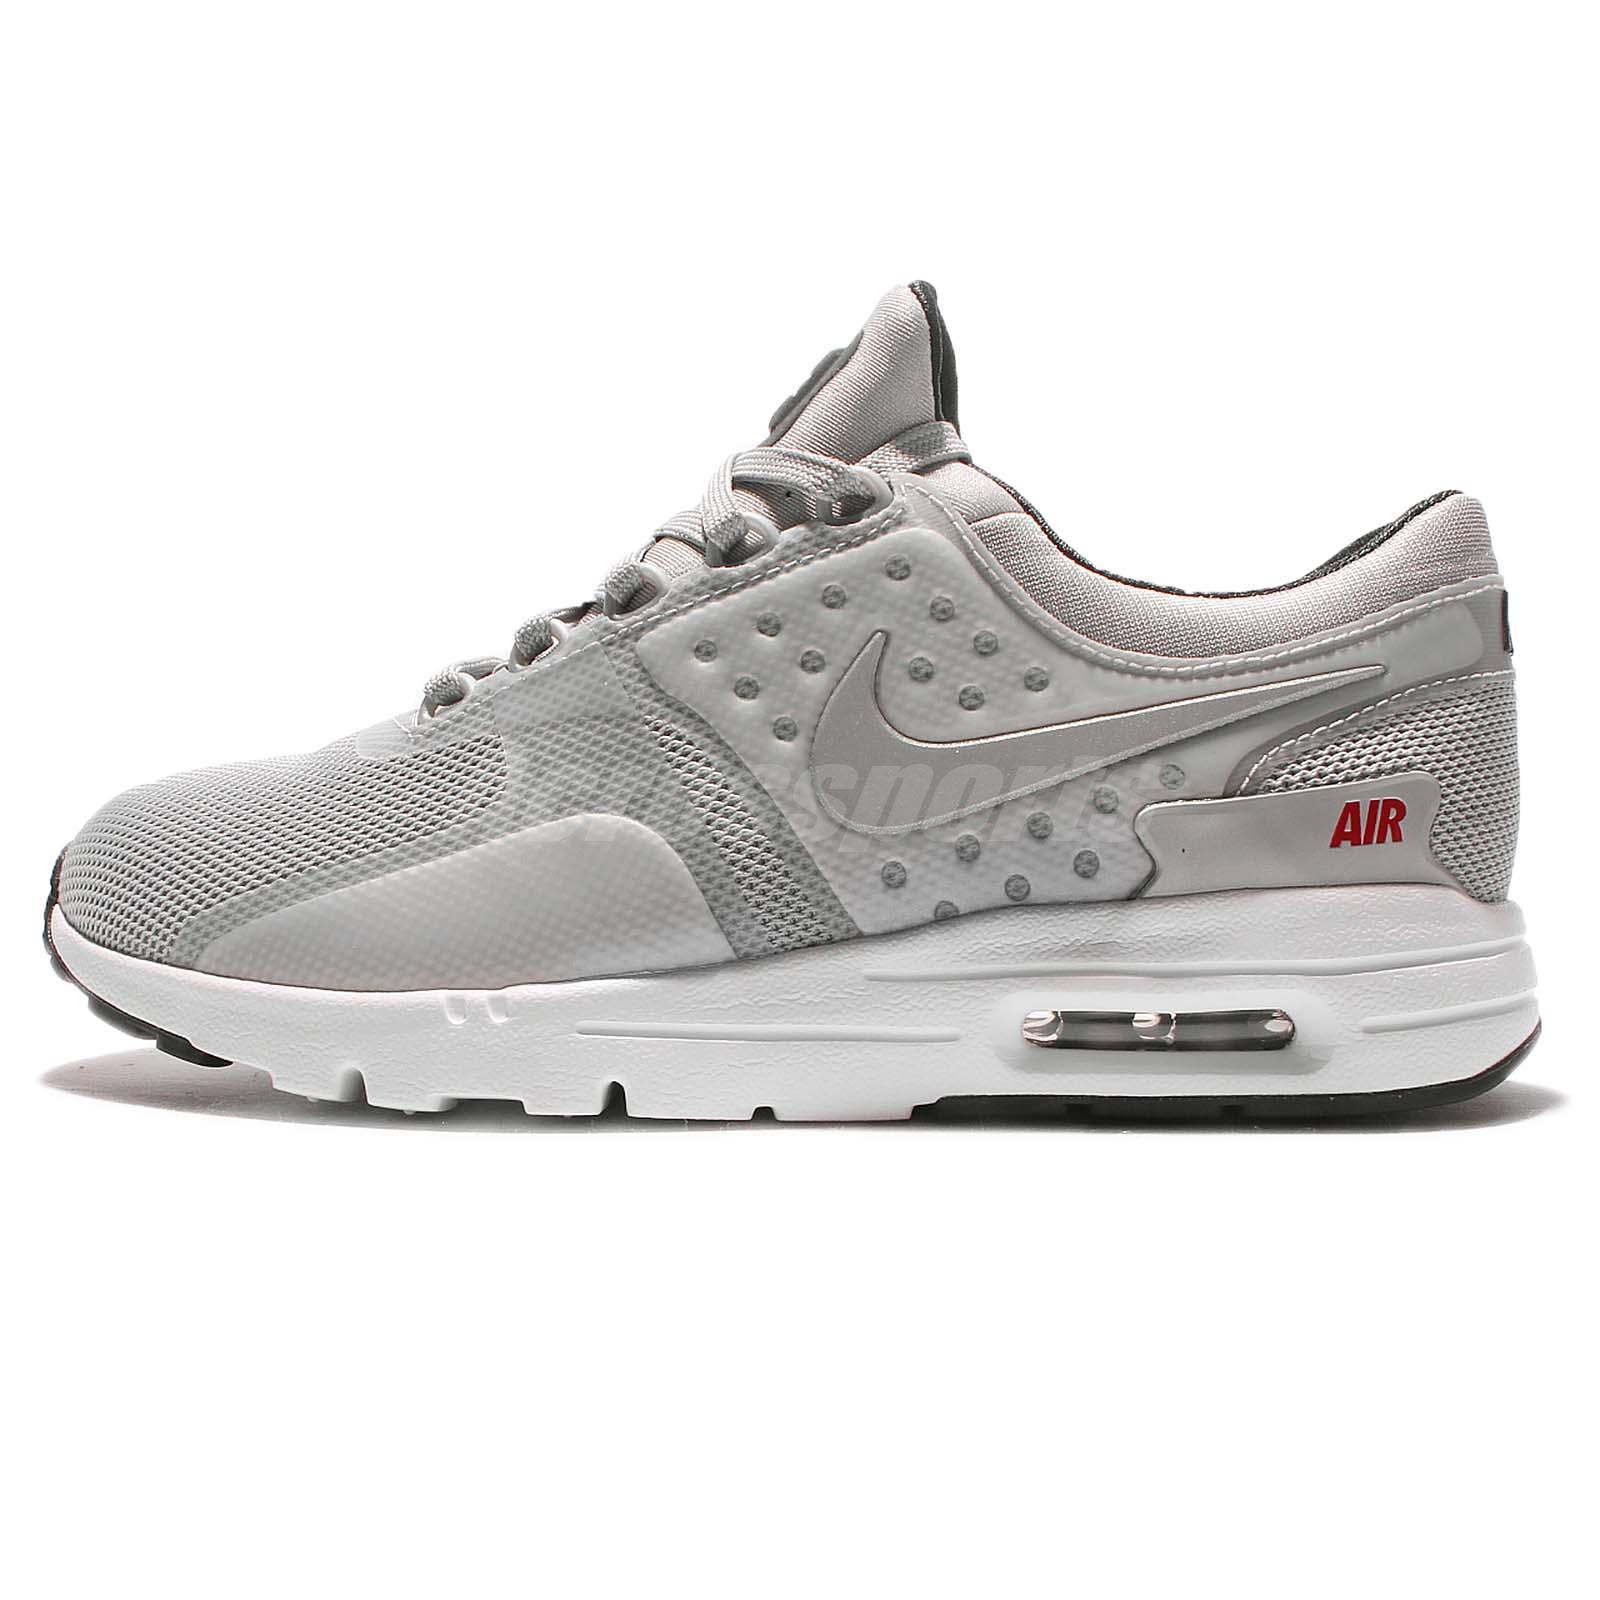 4e34ebedd13143 202d0 98f5e  cheap wmns nike air max zero qs metallic silver women running shoes  tinker 863700 002 5f188